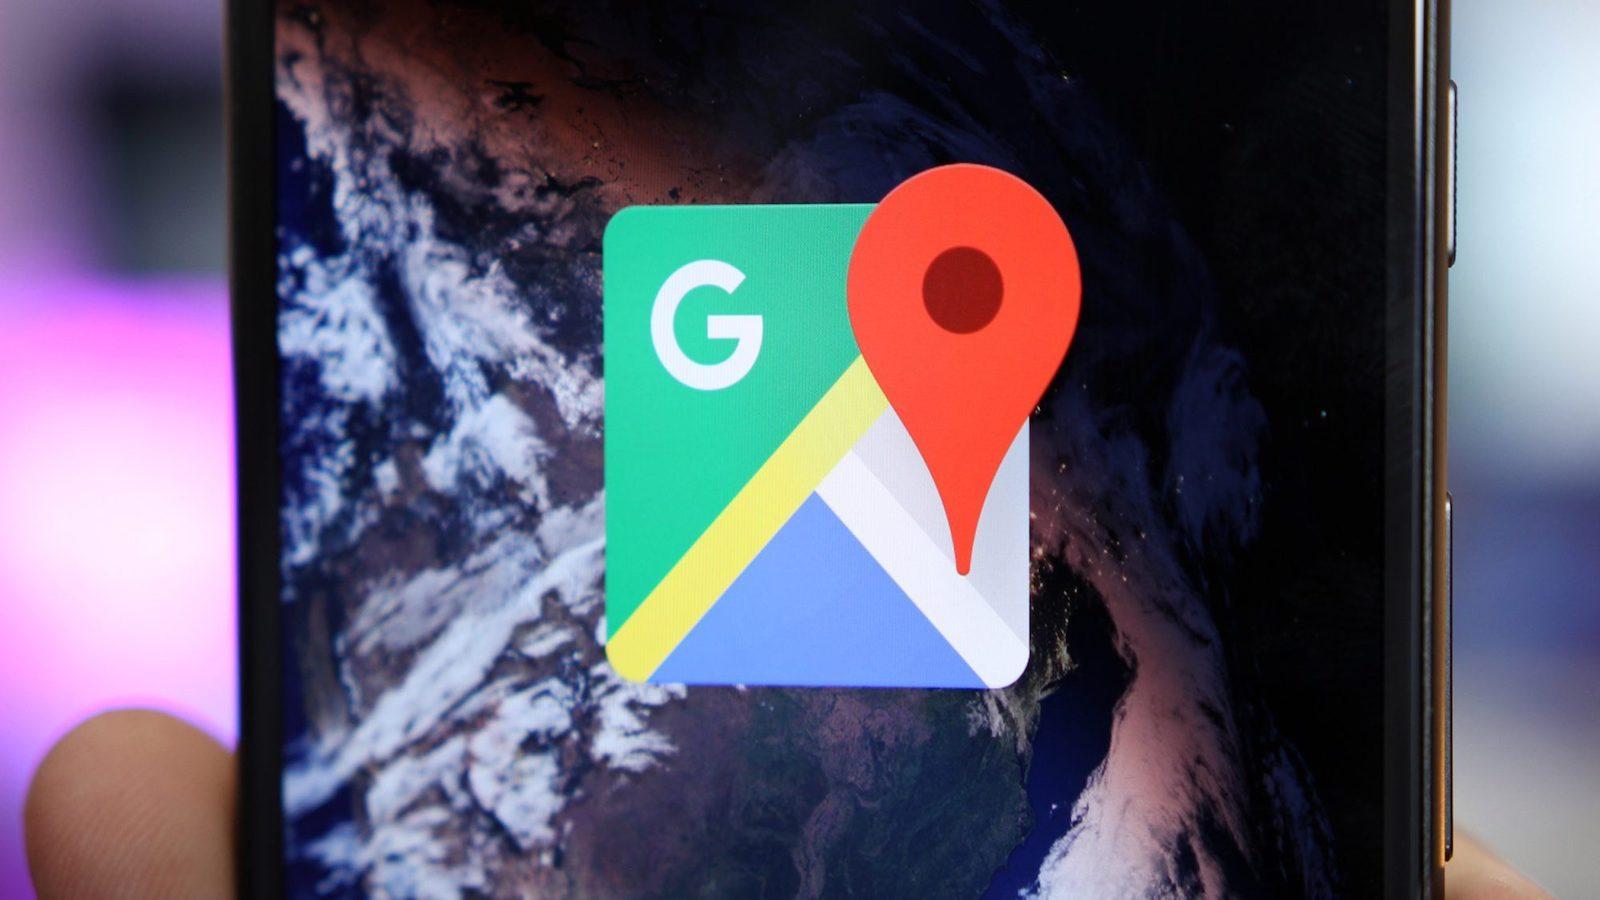 Google Maps adds live public transport updates for Sydney commuters